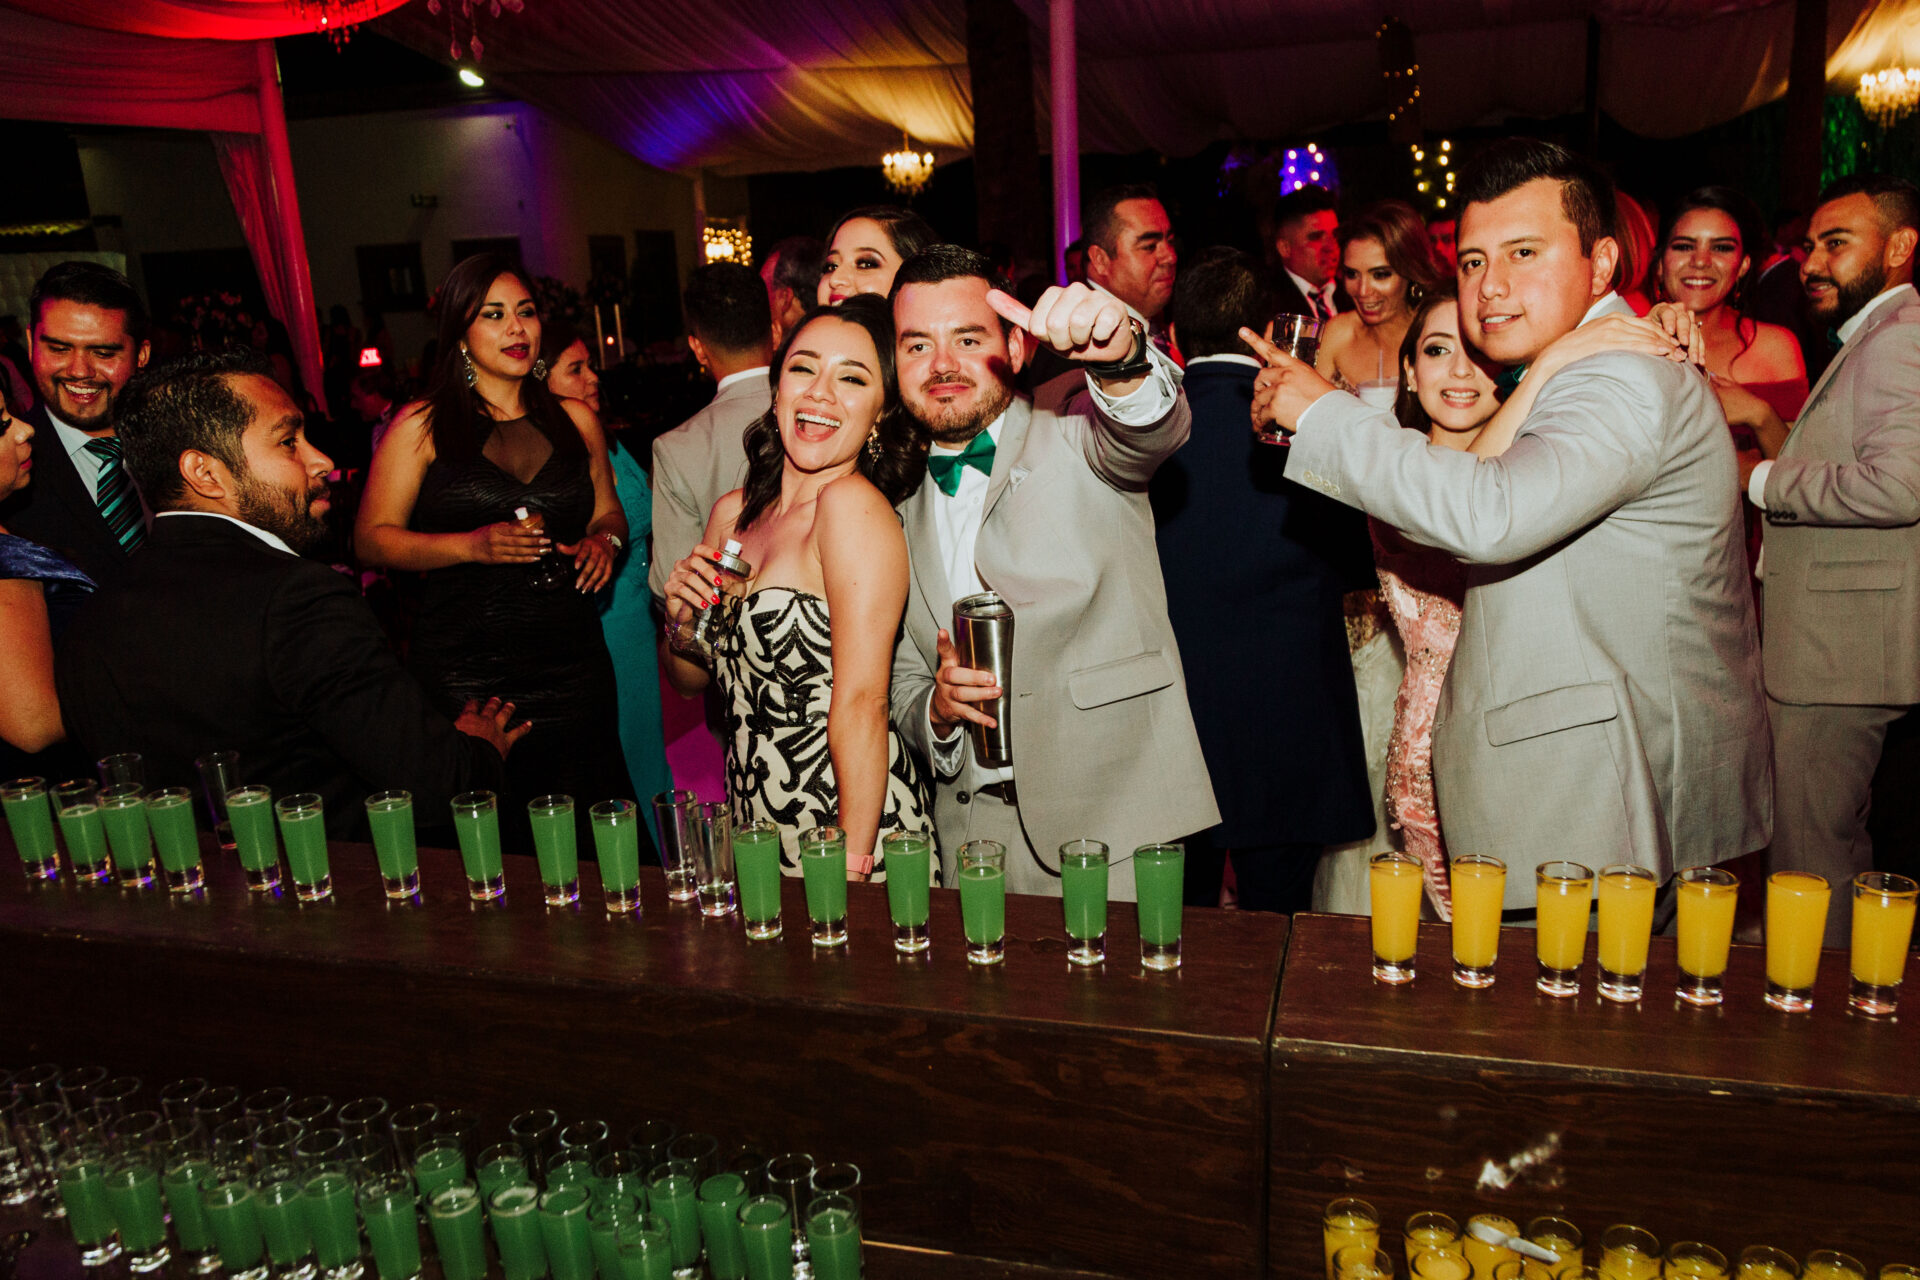 javier_noriega_fotografo_bodas_torreon_coahuila_zacatecas_wedding_photographer57a